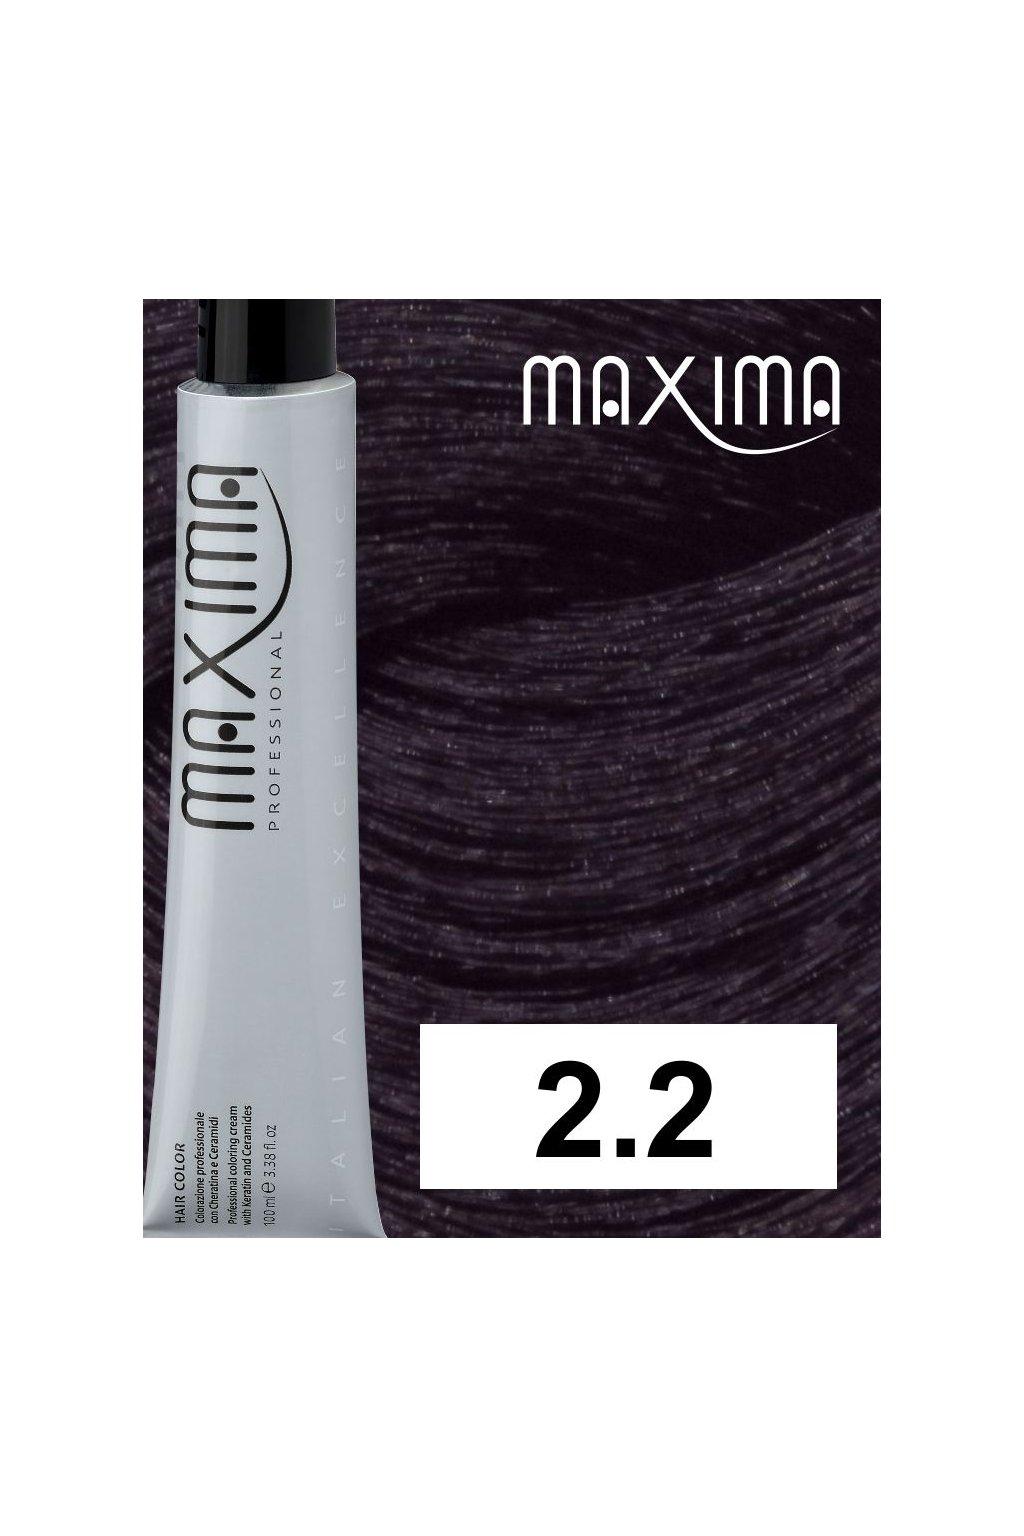 2 2 max